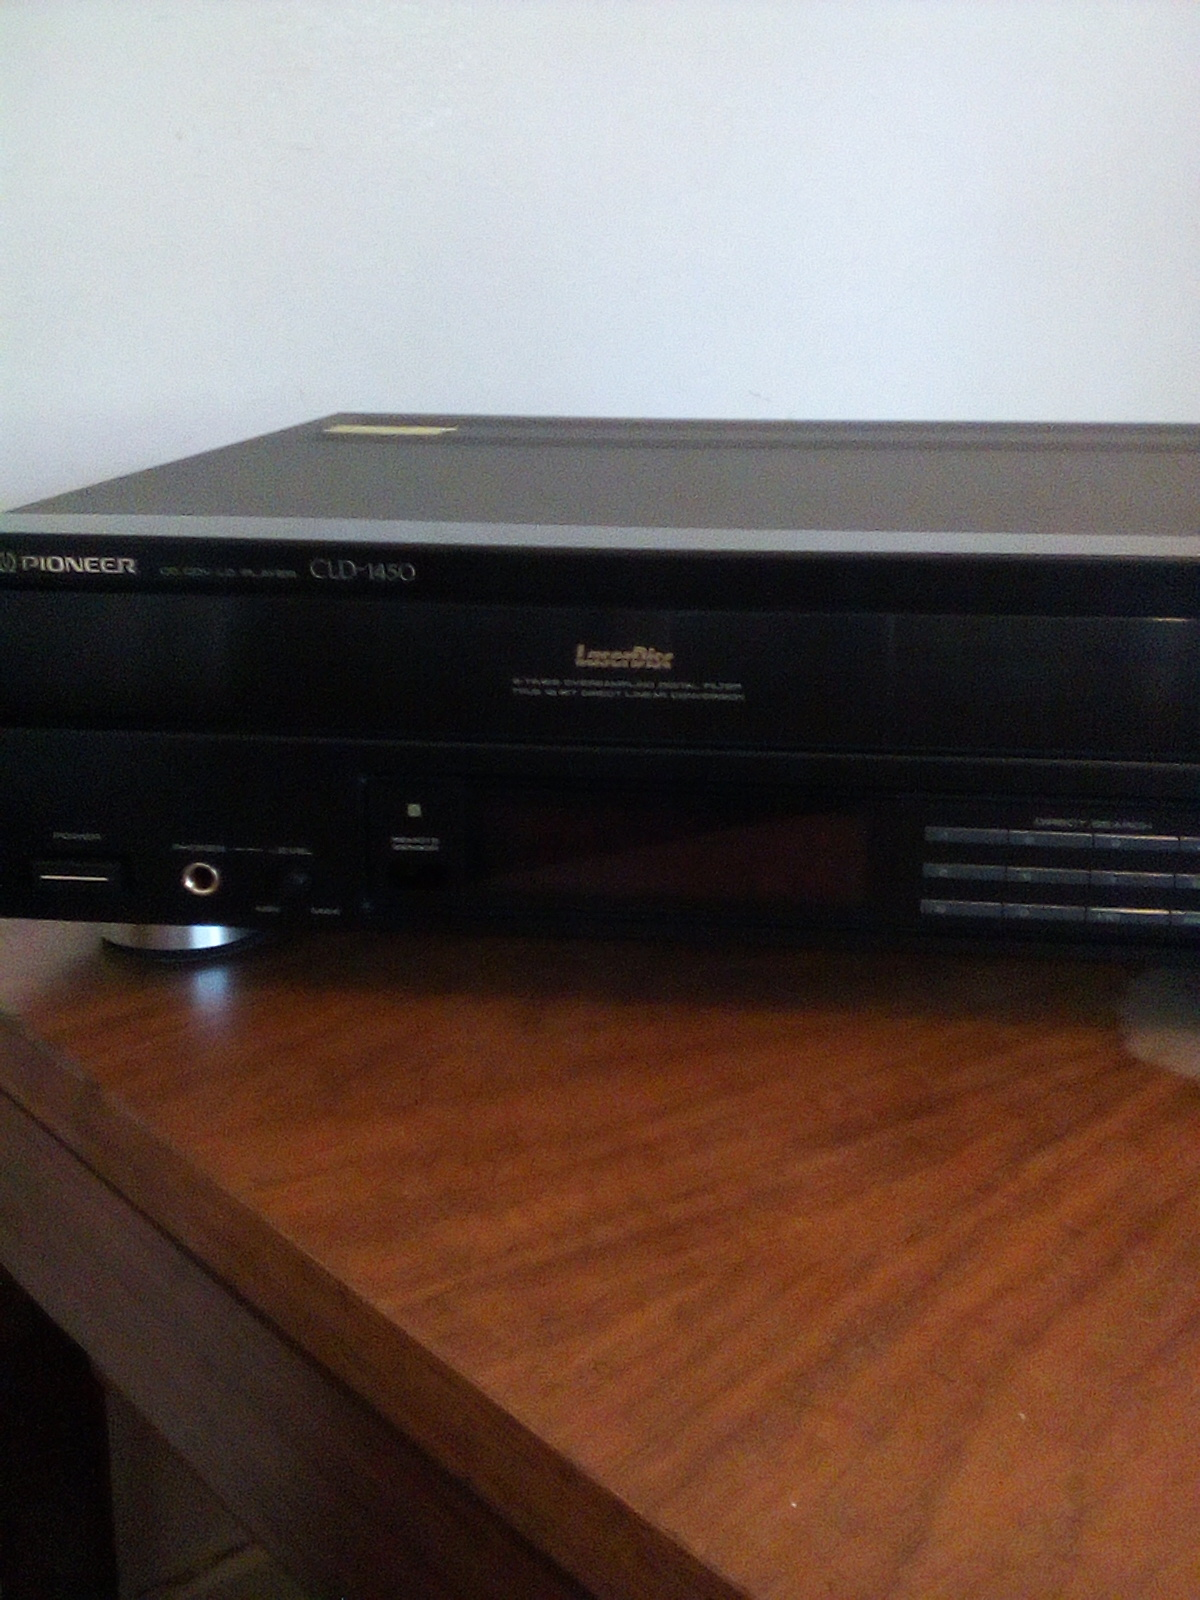 Pioneer CLD 1450 Laserdisc player